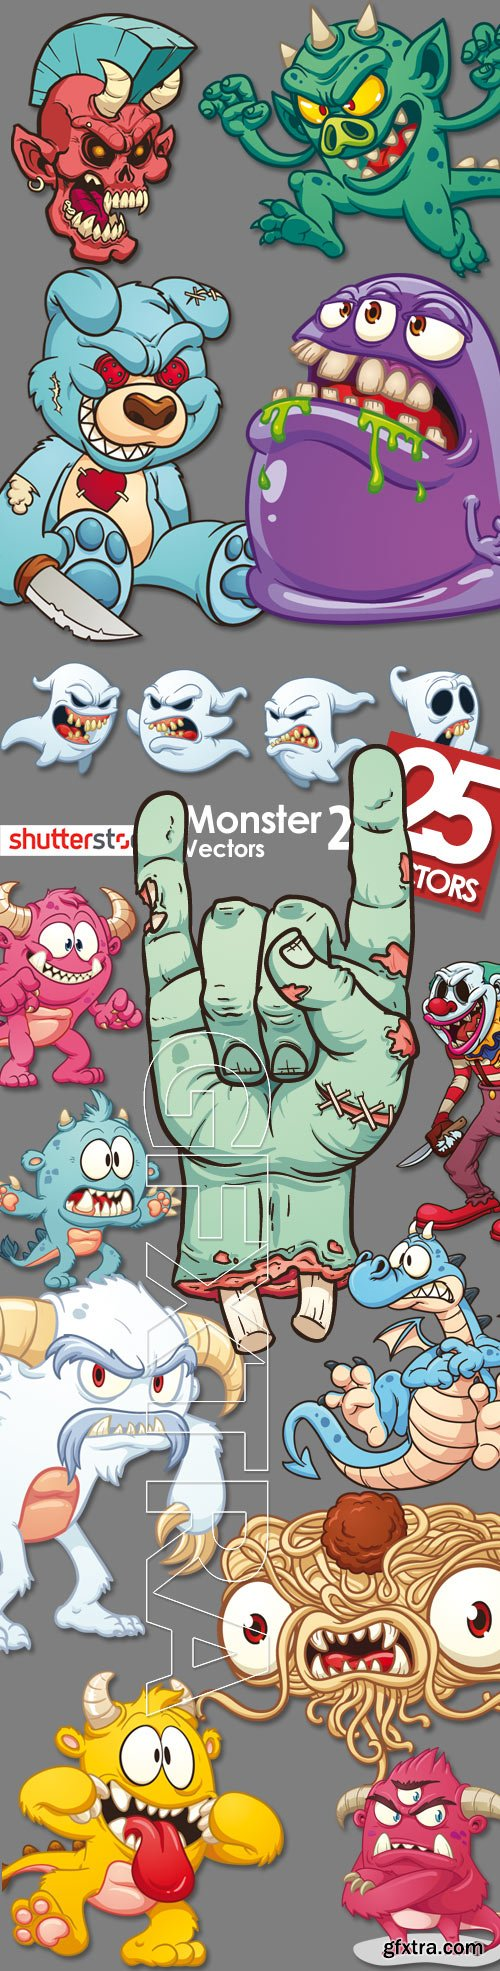 T shirt design 7 25xeps - Monster Vectors 2 25xeps T Shirtvectorsmonsters